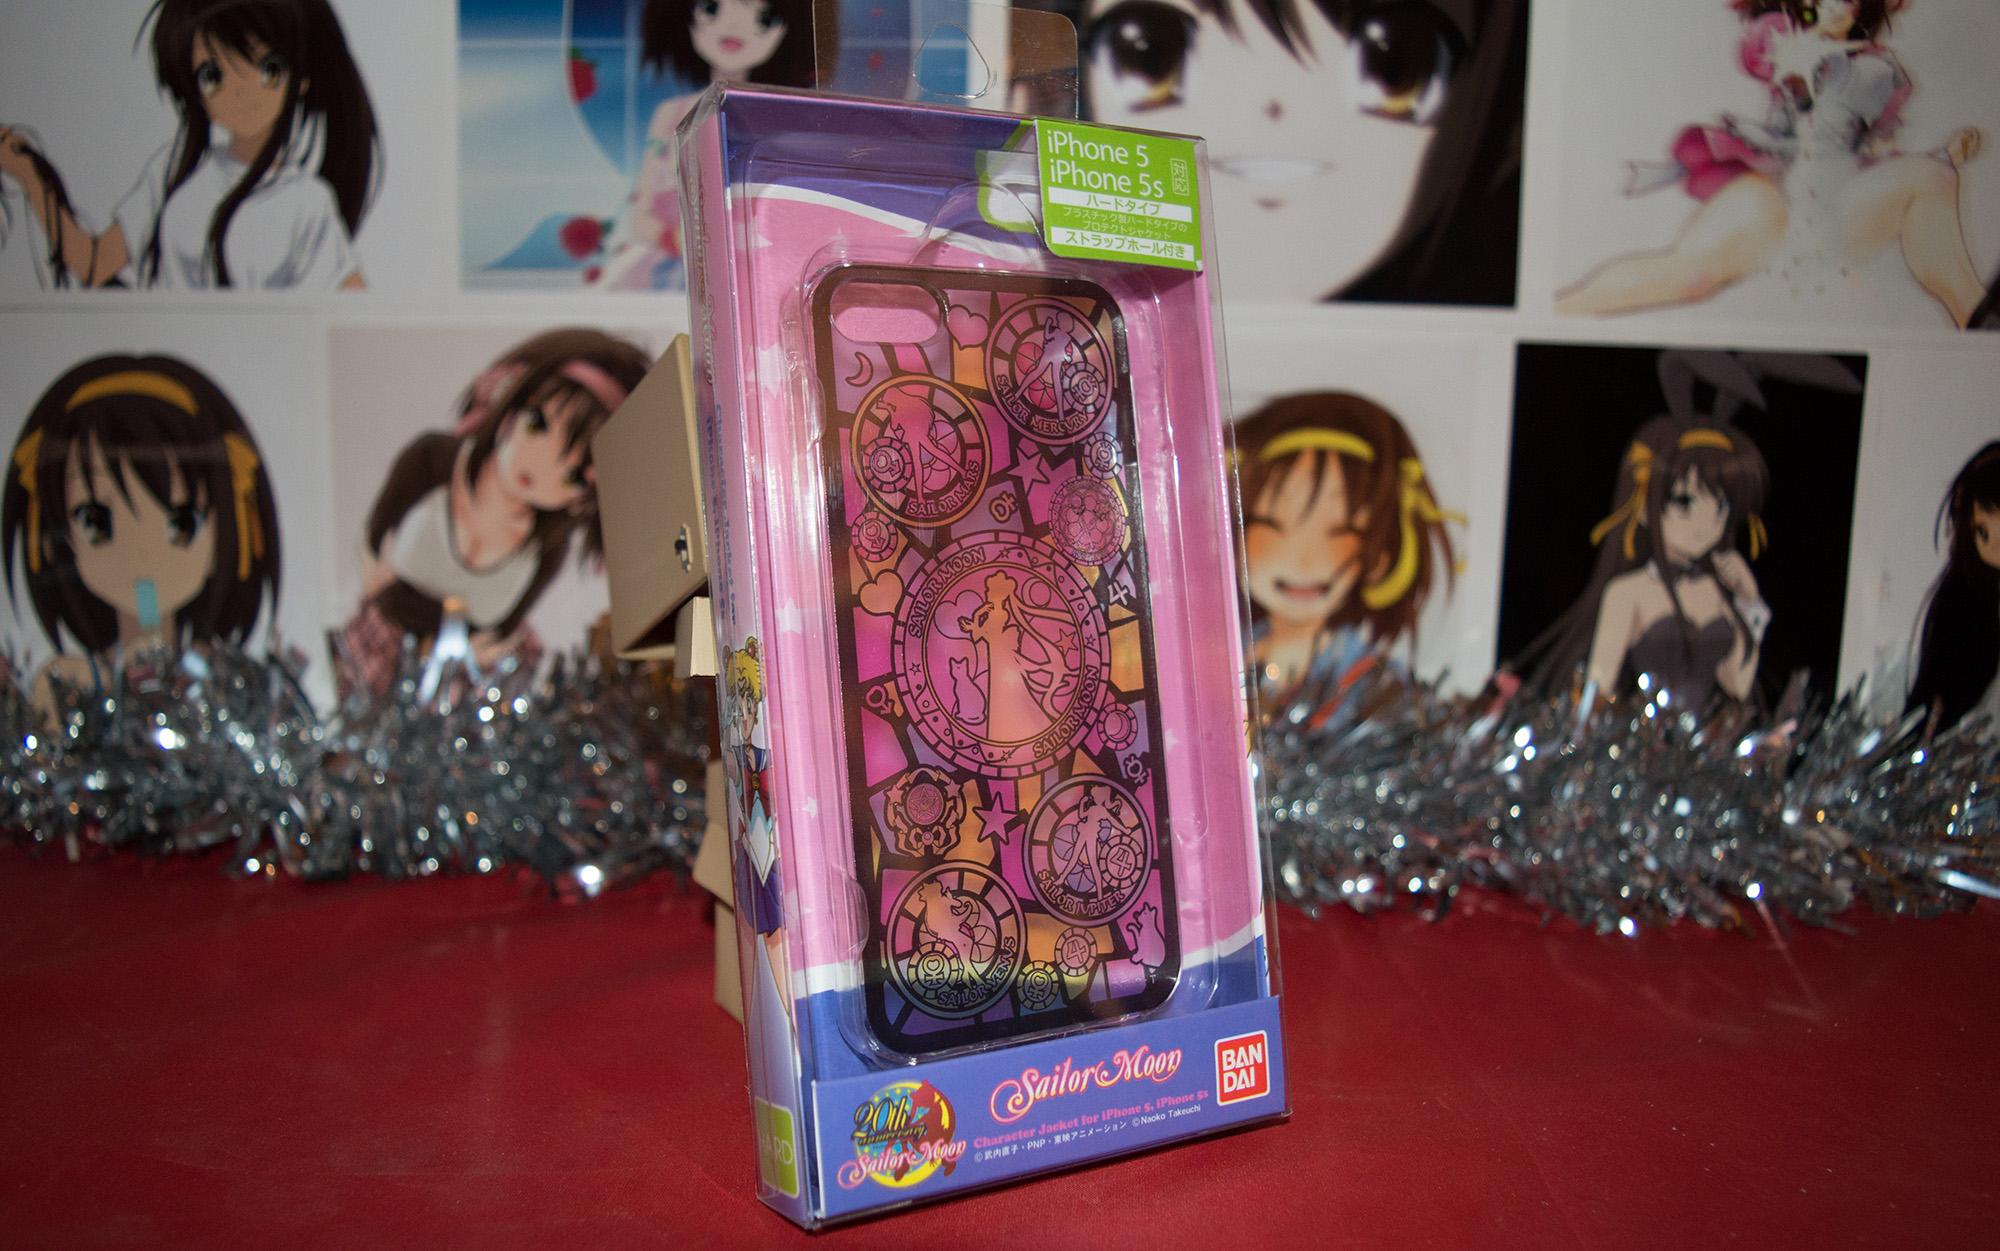 JList Fuku-Bukuro Lucky Anime Toy Set Overview haruhichan.com Sailor Moon - iPhone 5 5s case